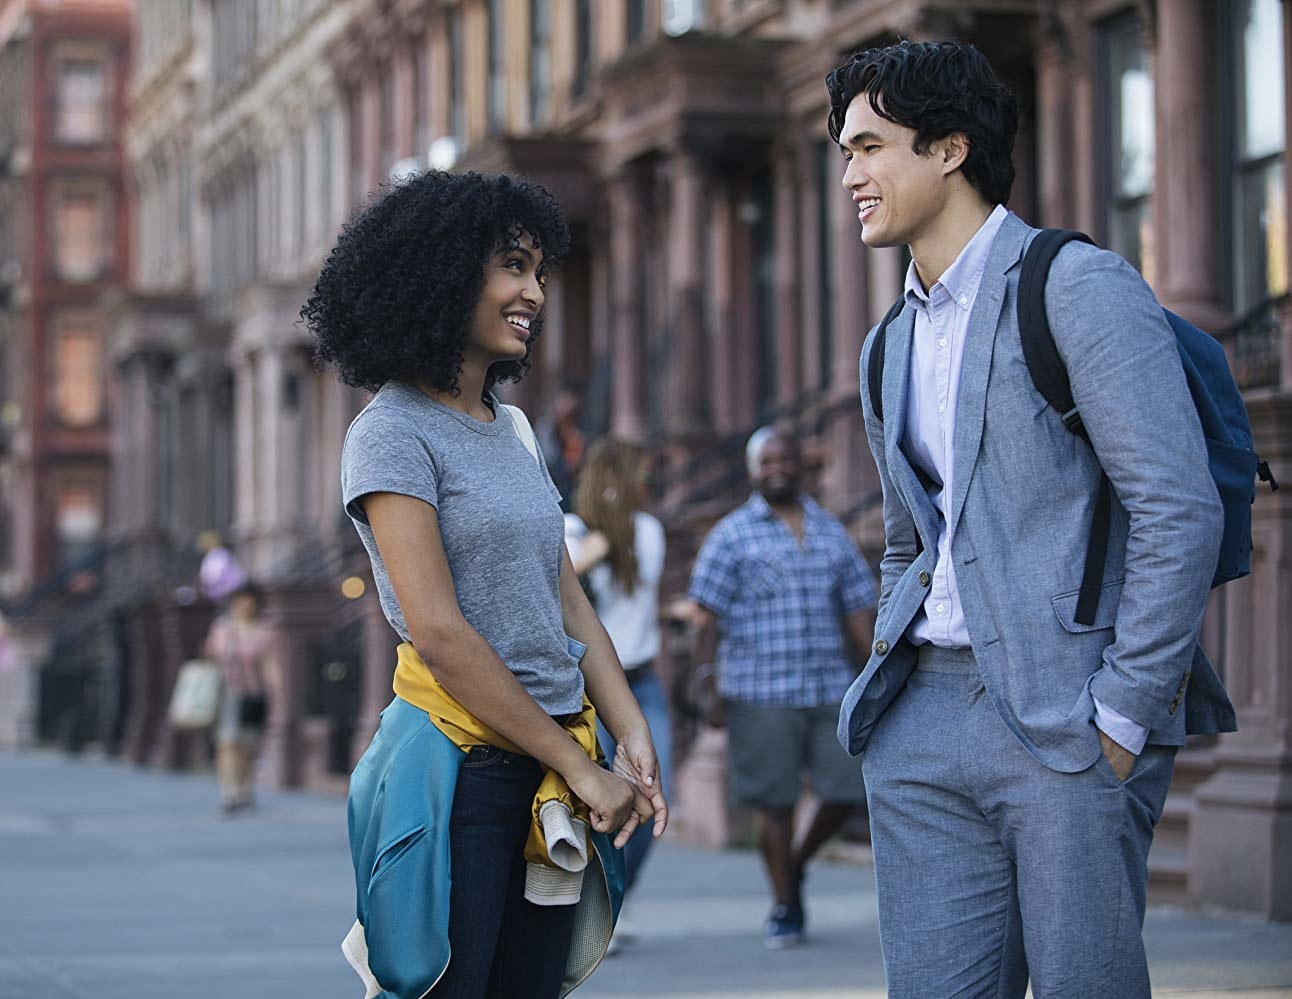 Yara Shahidi as Natasha smiles and talks with Daniel (Charles Melton) in the streets of New York City.